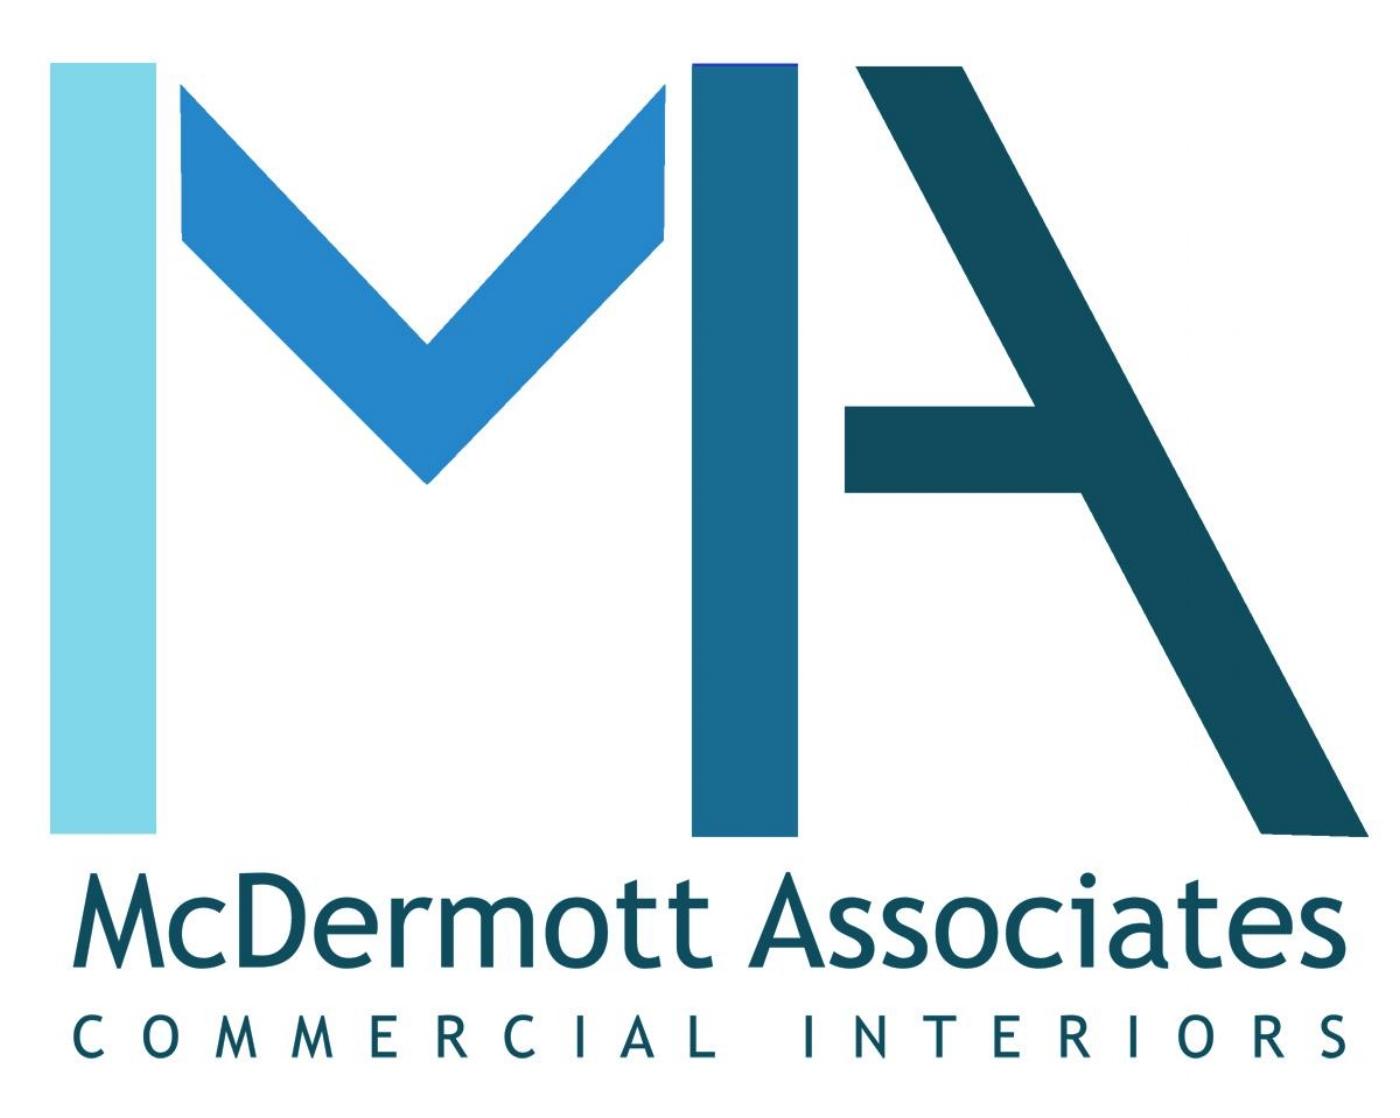 Commercial Interior Design Denver Colorado Top Architect